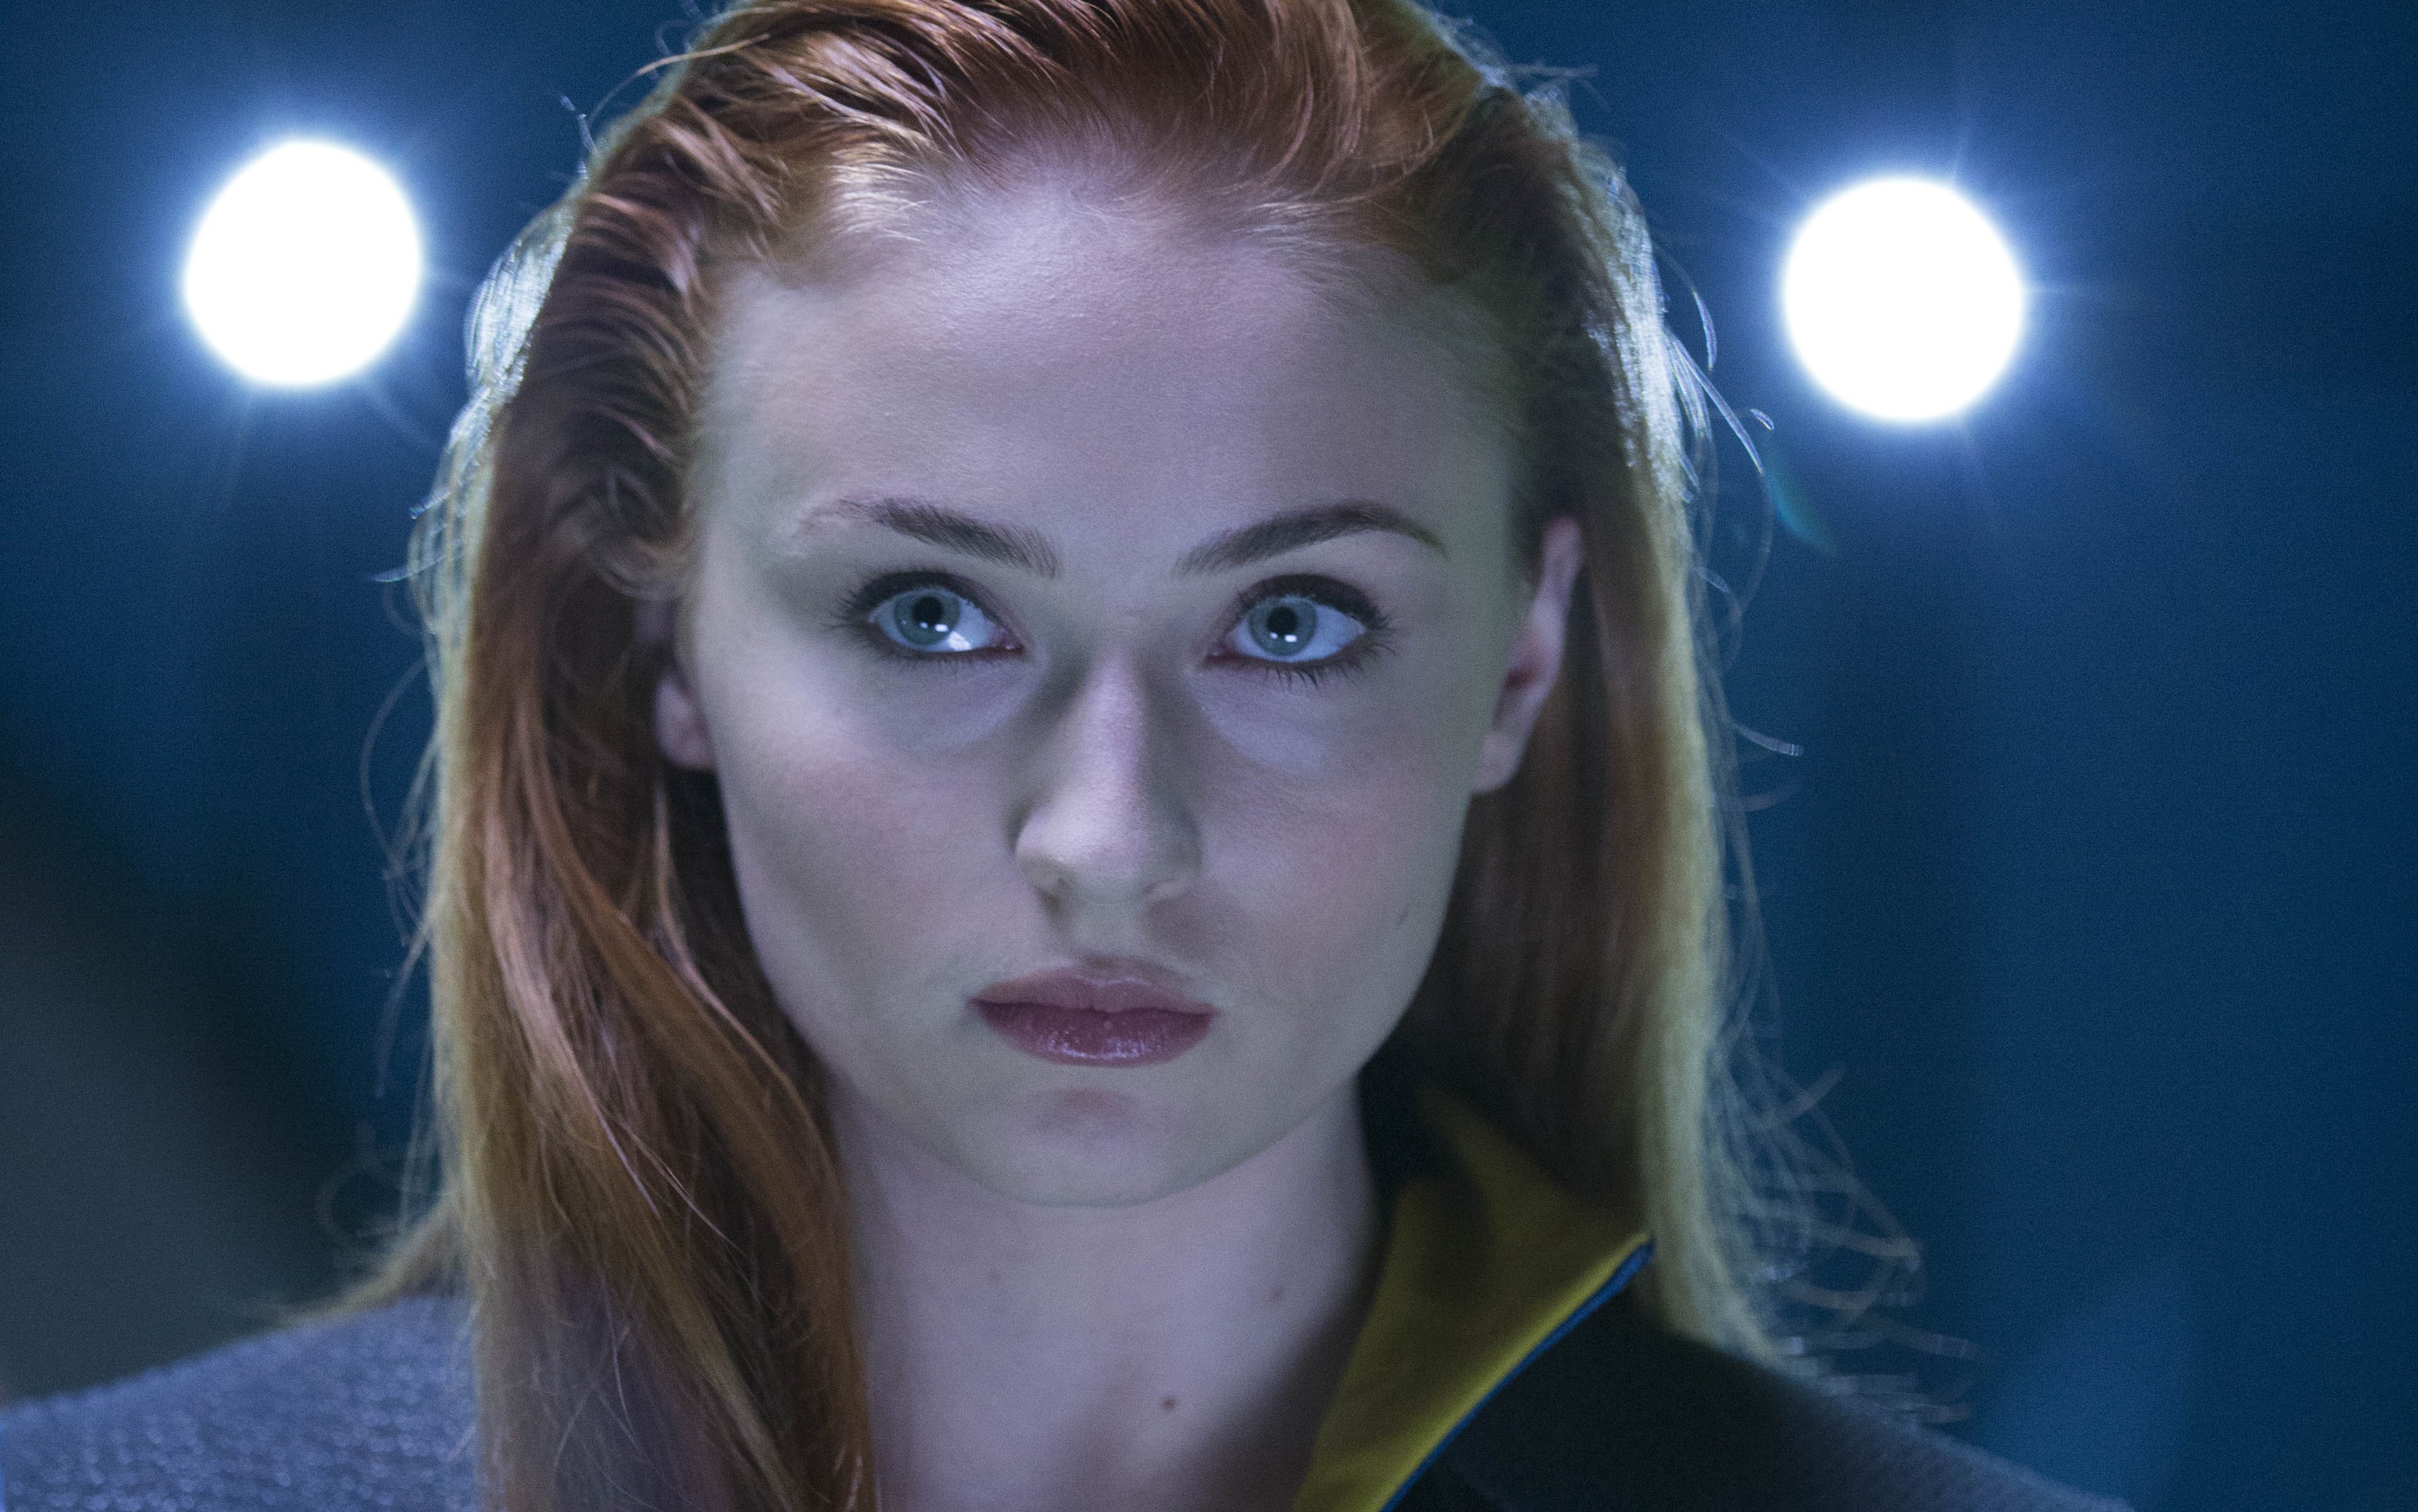 Sophie Turner in 'X-Men Apocalypse'